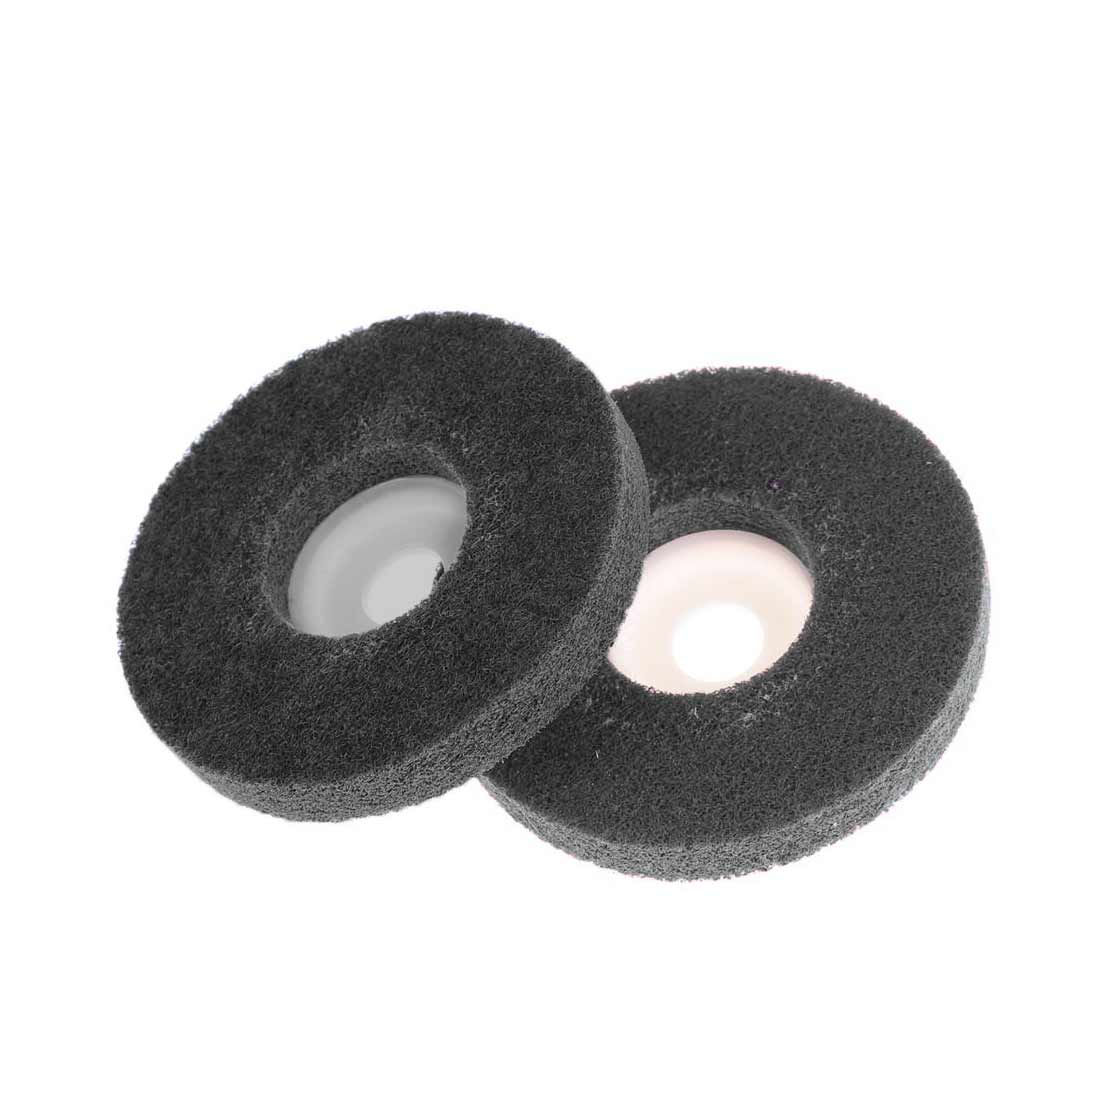 100*12*16mm Nylon Grinding Disc 180# Non-woven Unitized Polishing Wheel For Soft Metal Stainless Steel